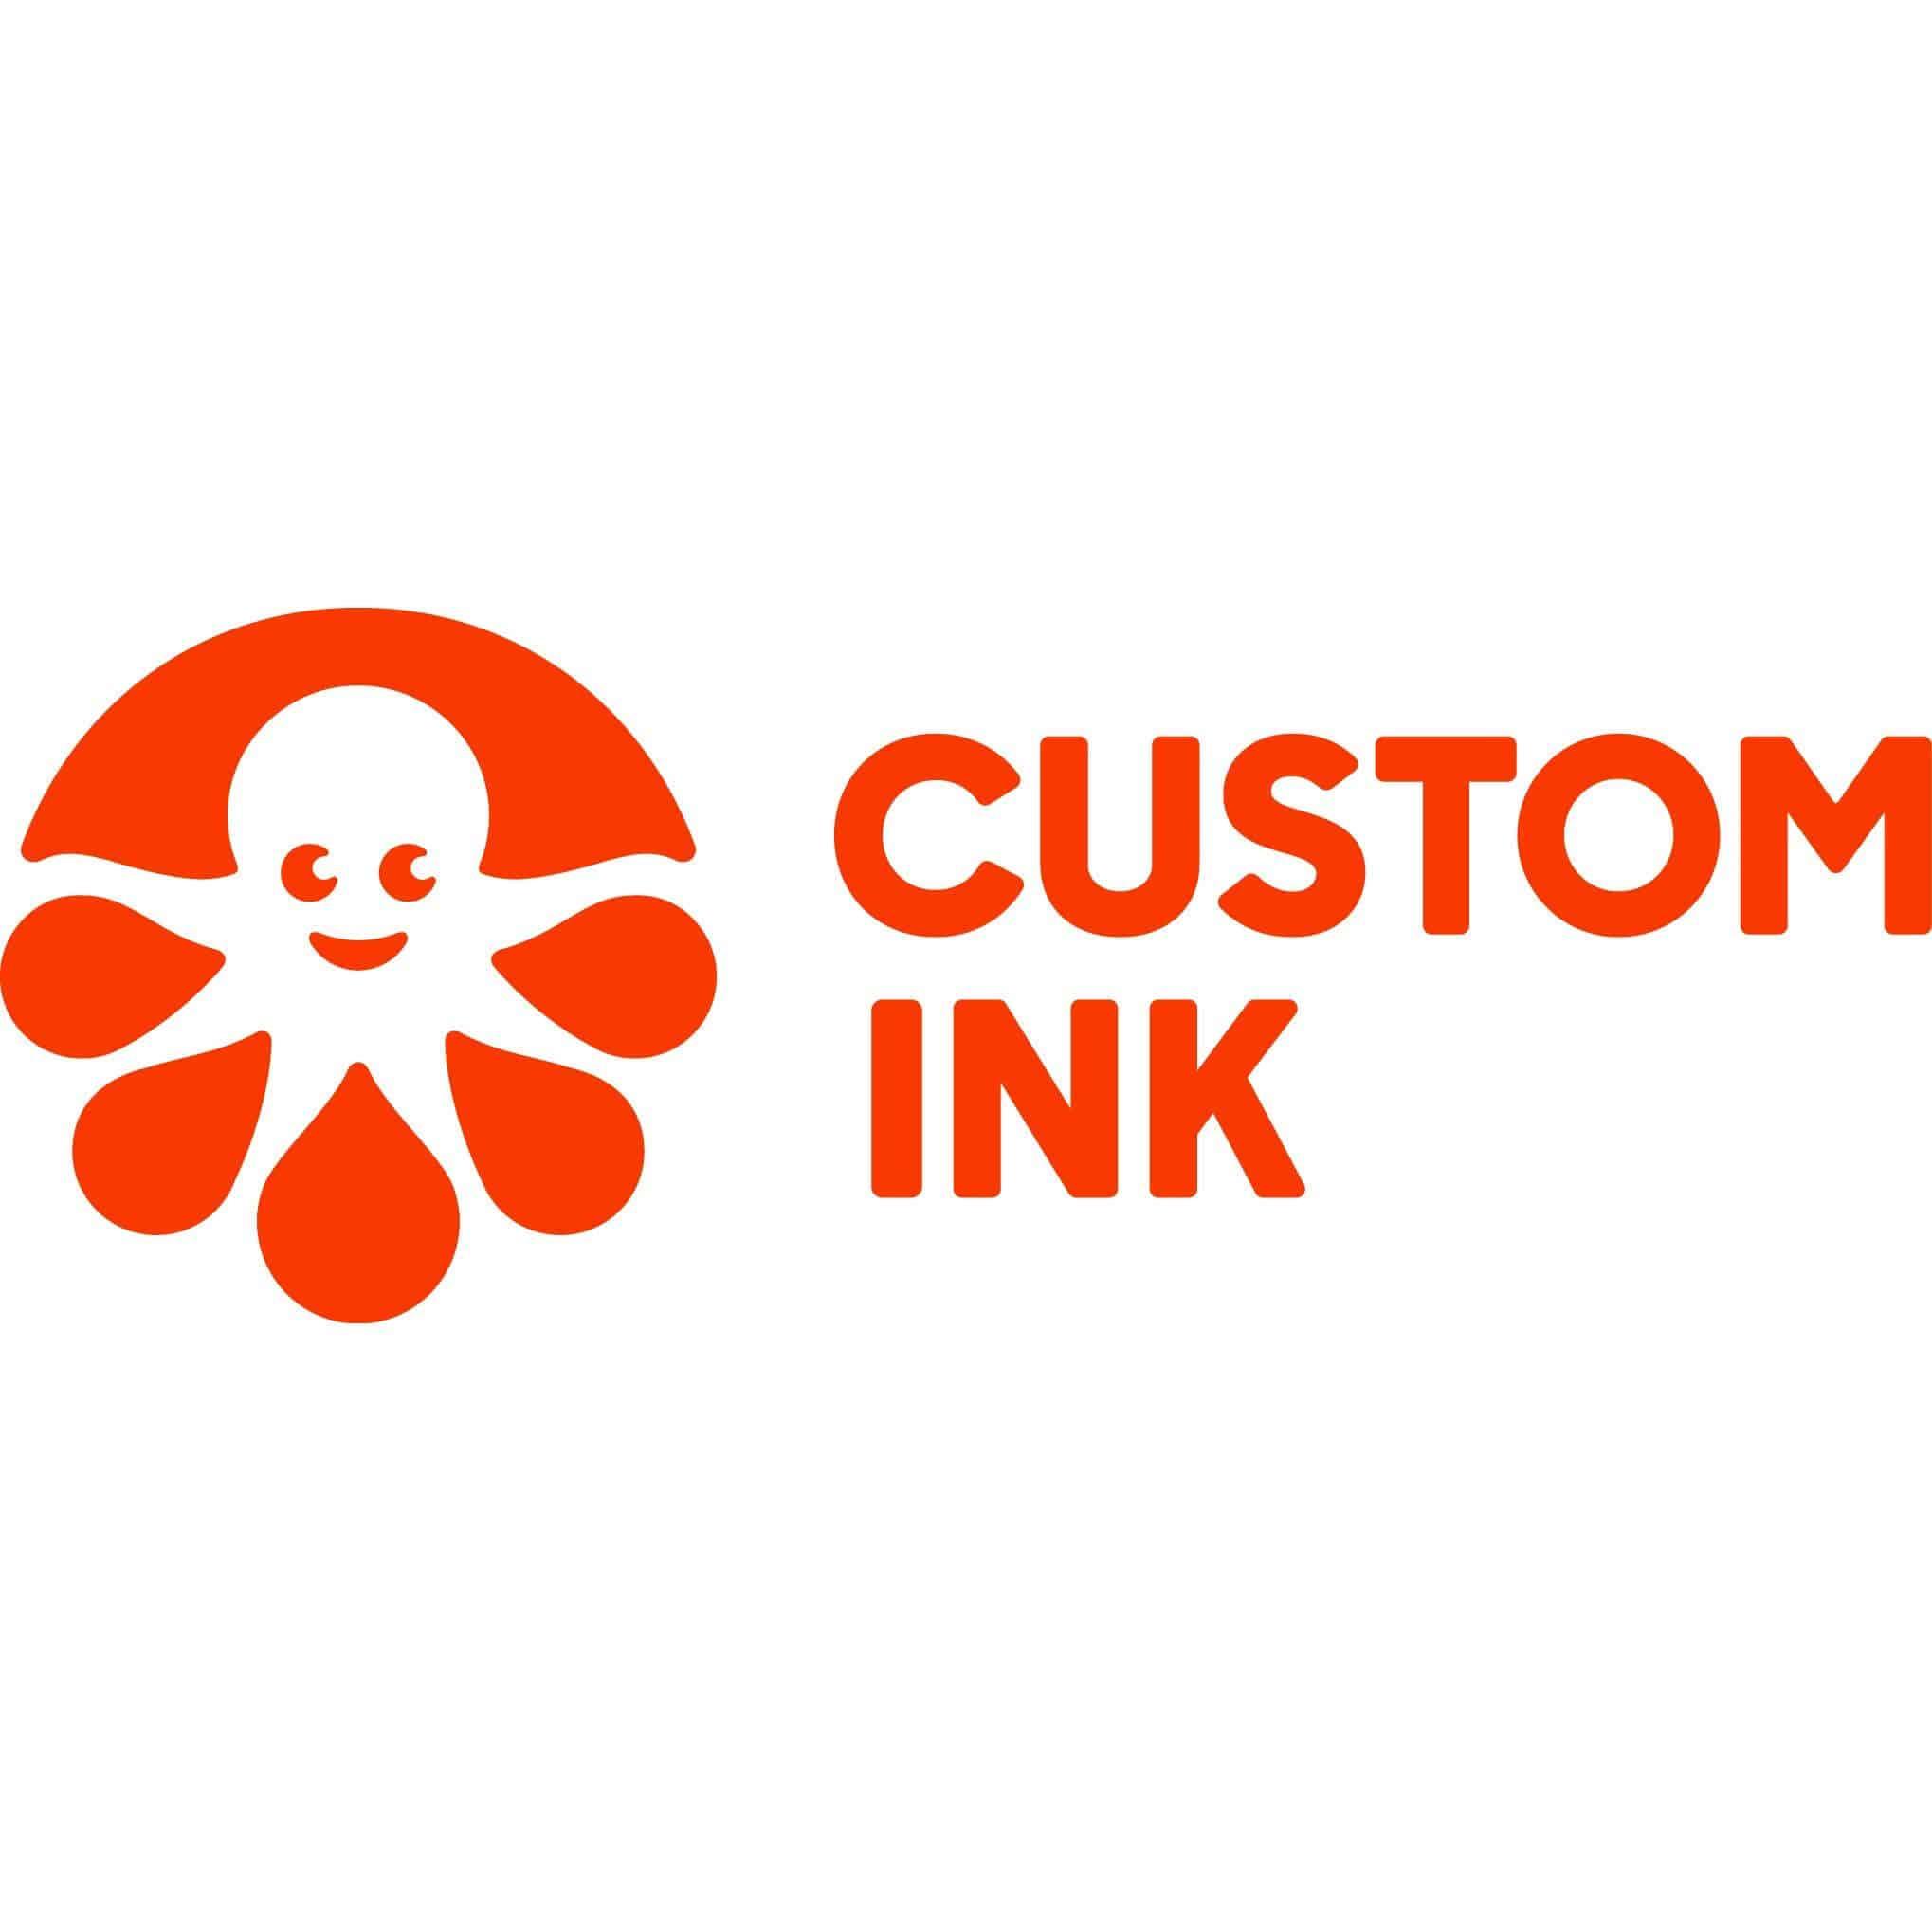 Custom Ink - trang web tự thiết kế online